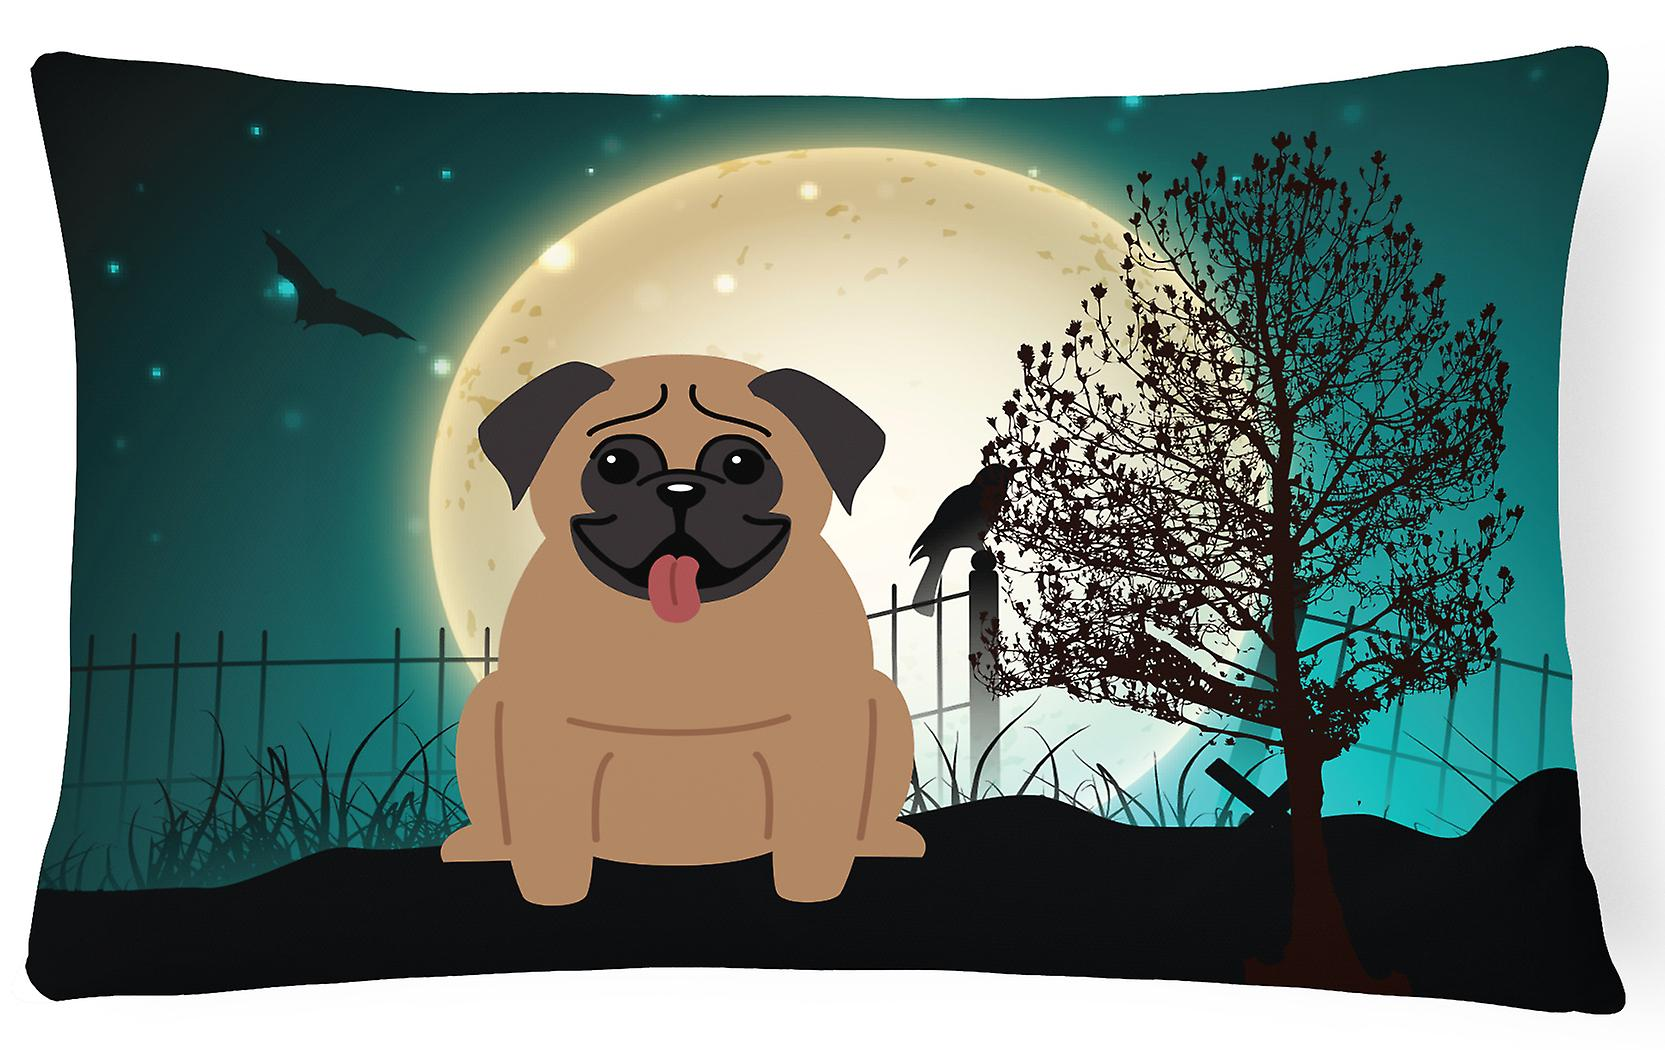 Décoratif Toile Pug Tissu Halloween Marron Oreiller Effrayant 0O8nwkP